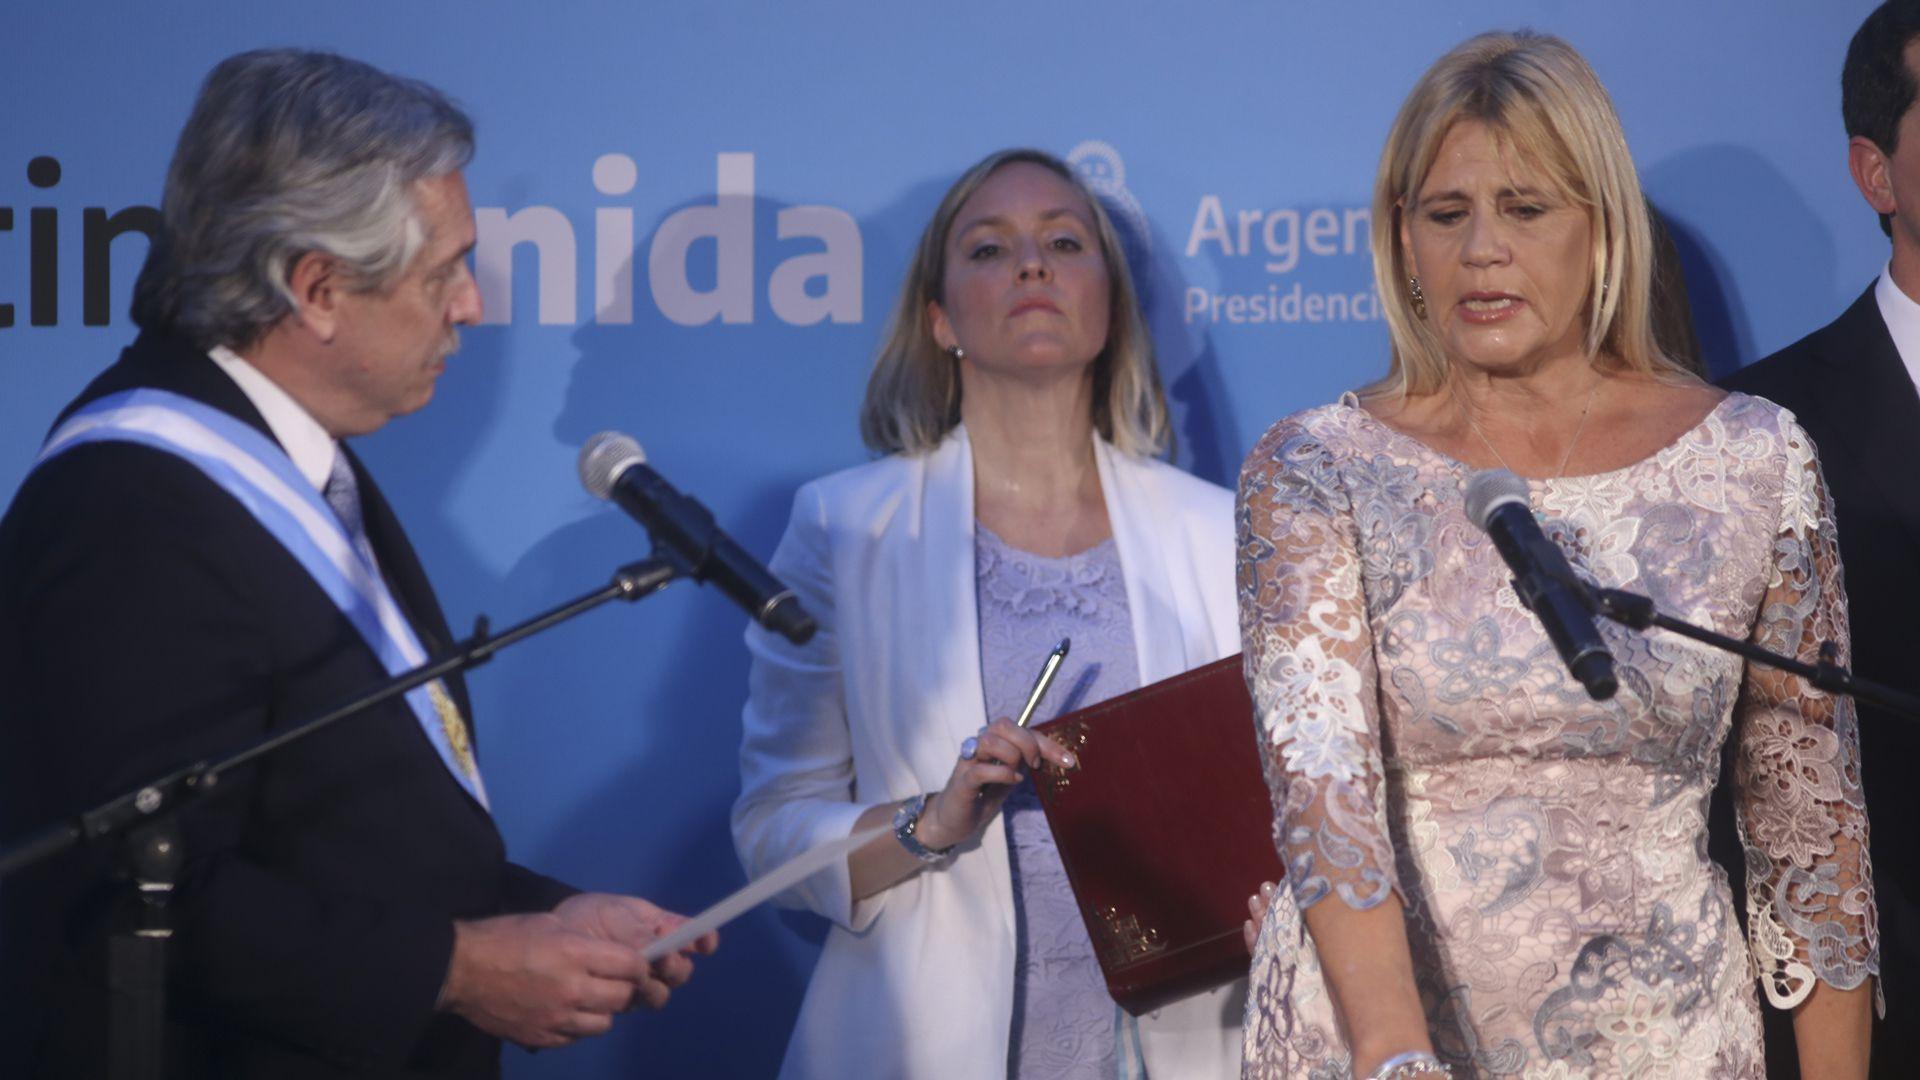 La ministra de Justicia Marcela Losardo (Foto NA: MARIANO SANCHEZ)